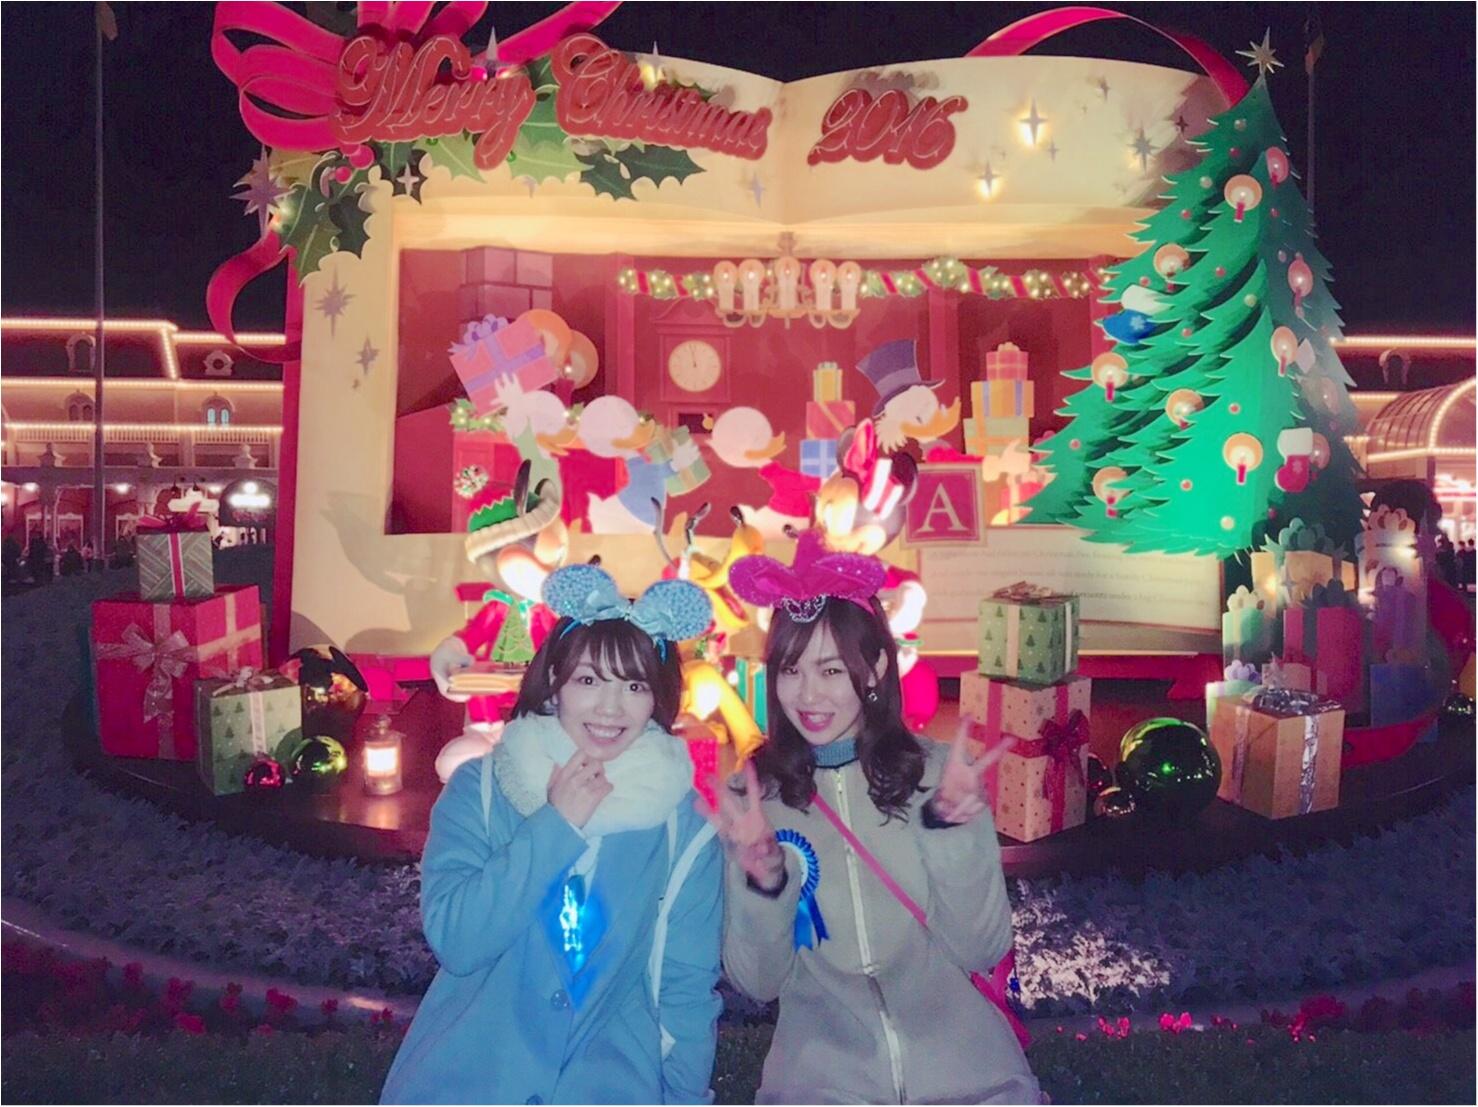 【♥︎♥︎♥︎】ホリデーシーズン真っ只中!クリスマスディズニーでおさめたい写真はこれ♡_1